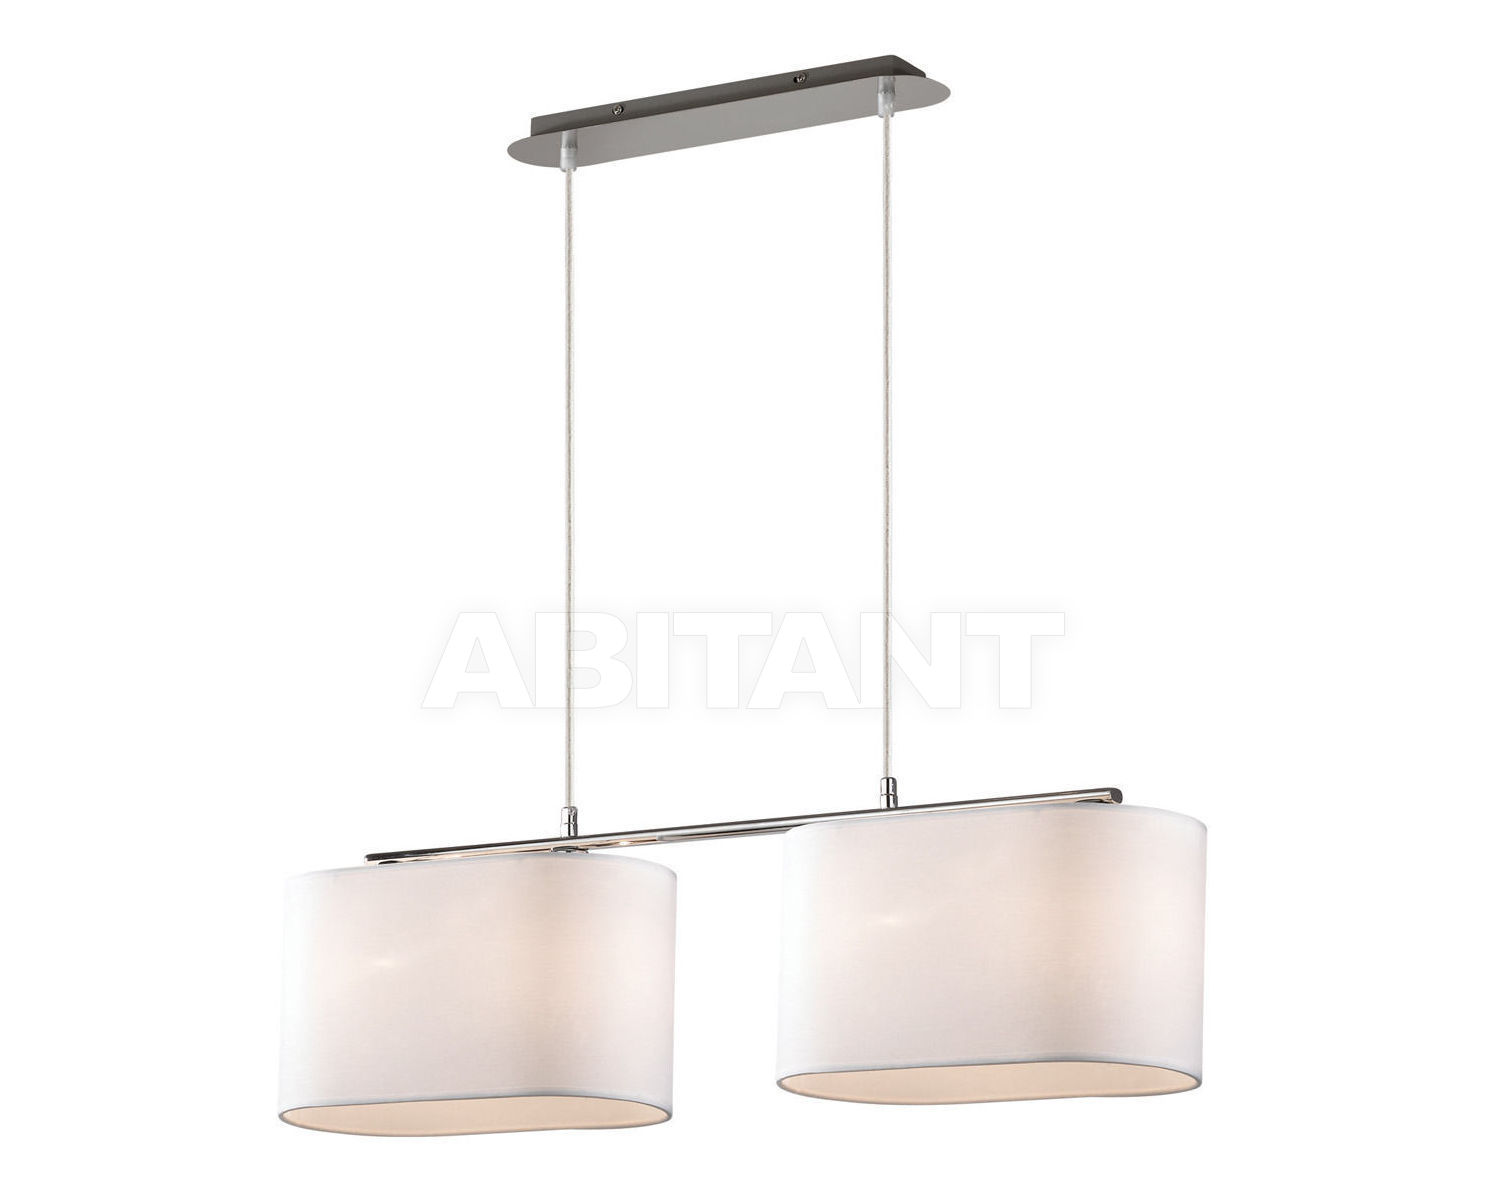 Купить Светильник Ideal Lux 2013-2014 SHERATON SB4 BIANCO